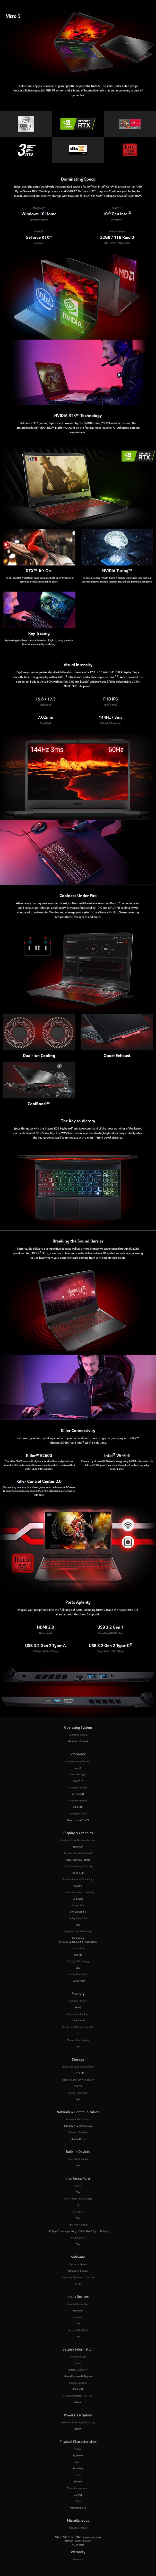 acer-nitro-5-gaming-156-laptop-i710750h-16gb-512gb-gtx-1660ti-w10h-ac38197-8.jpg